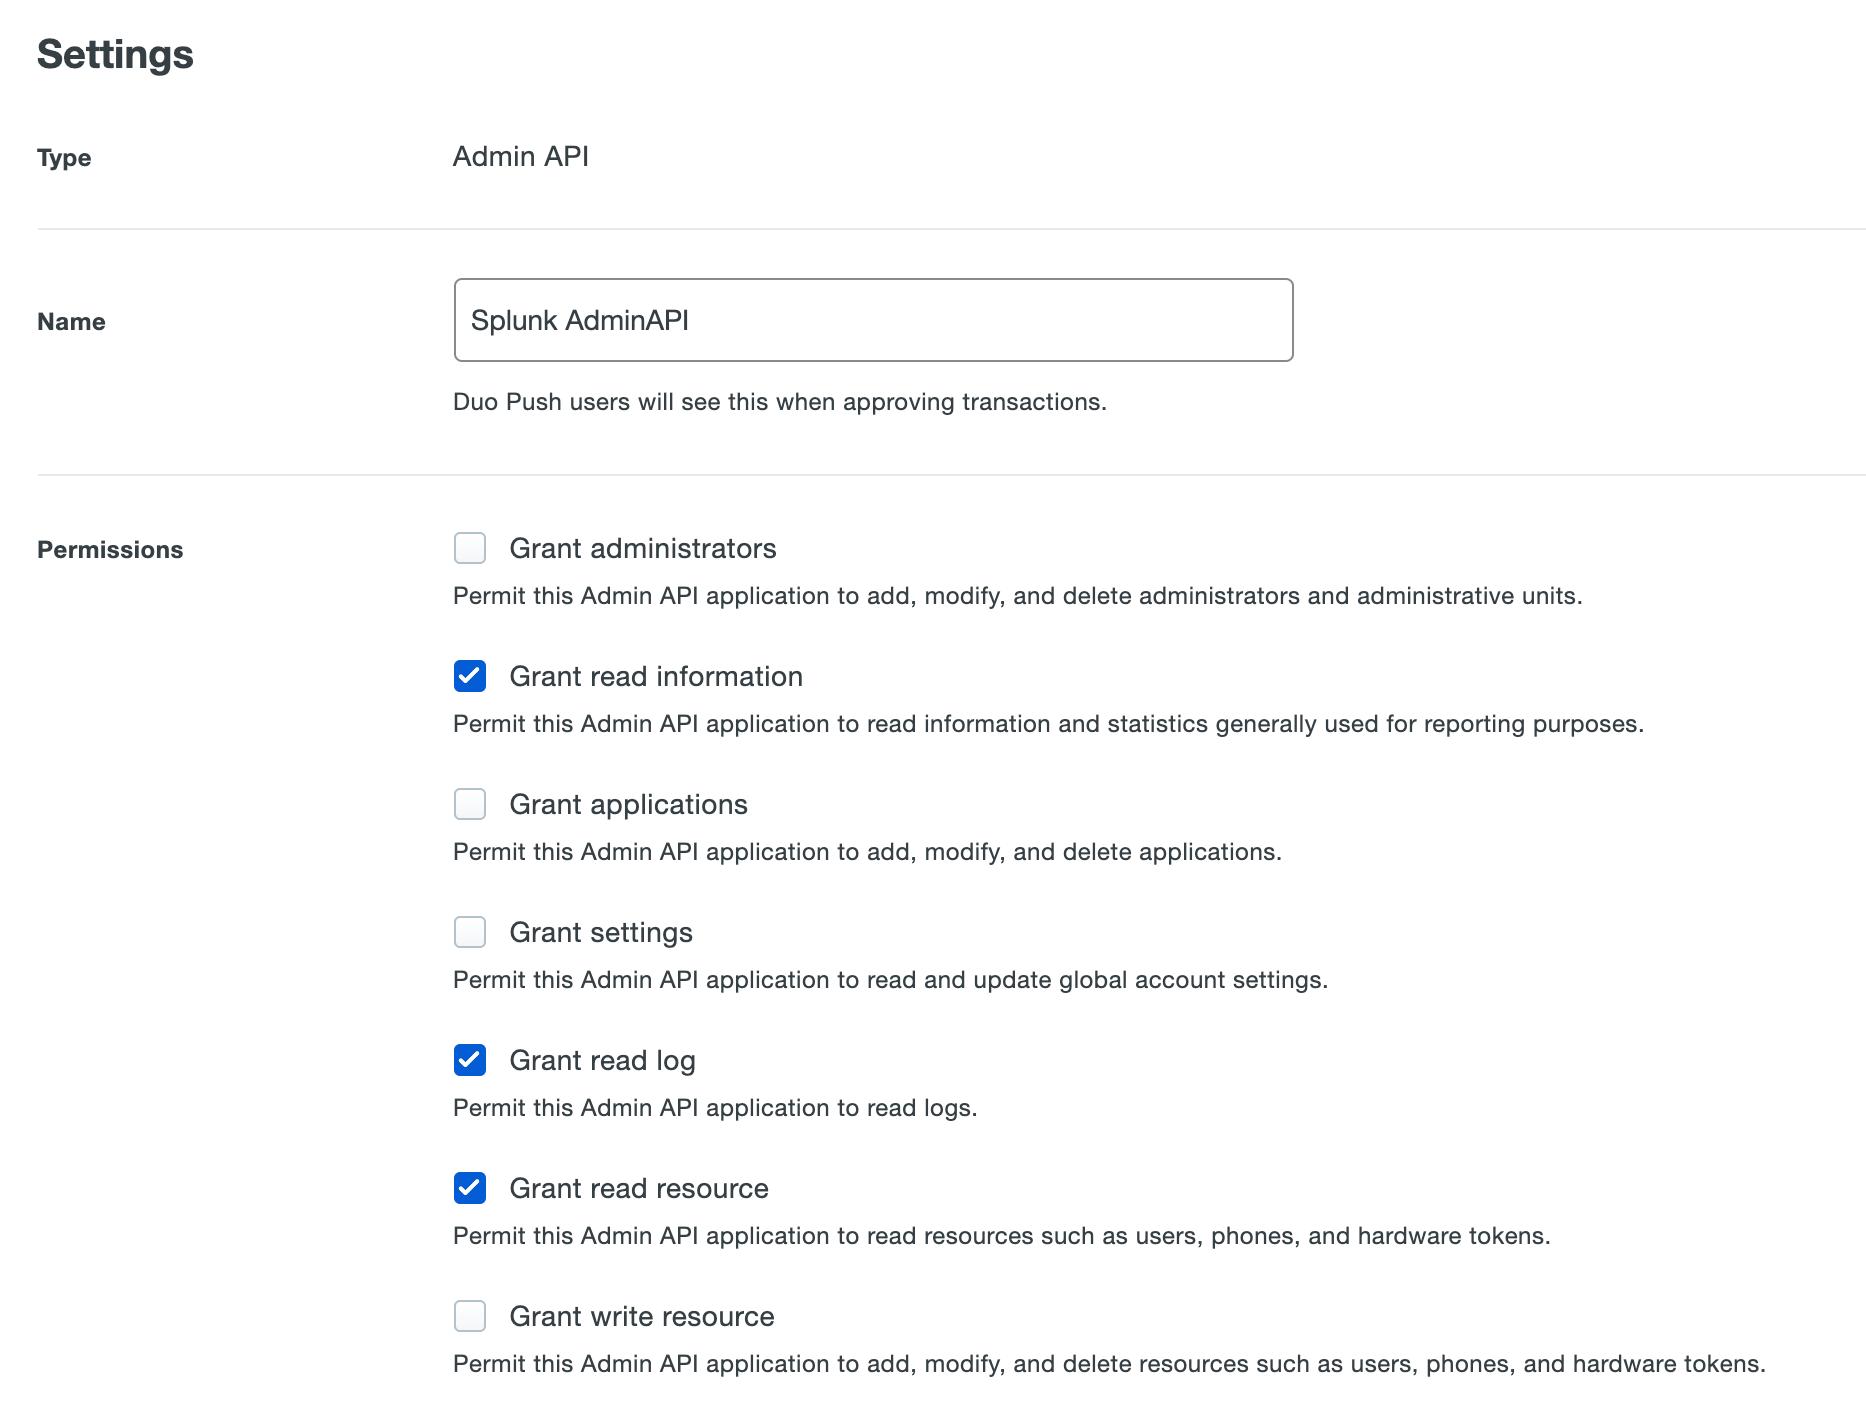 Admin API permissions for Splunk Connector